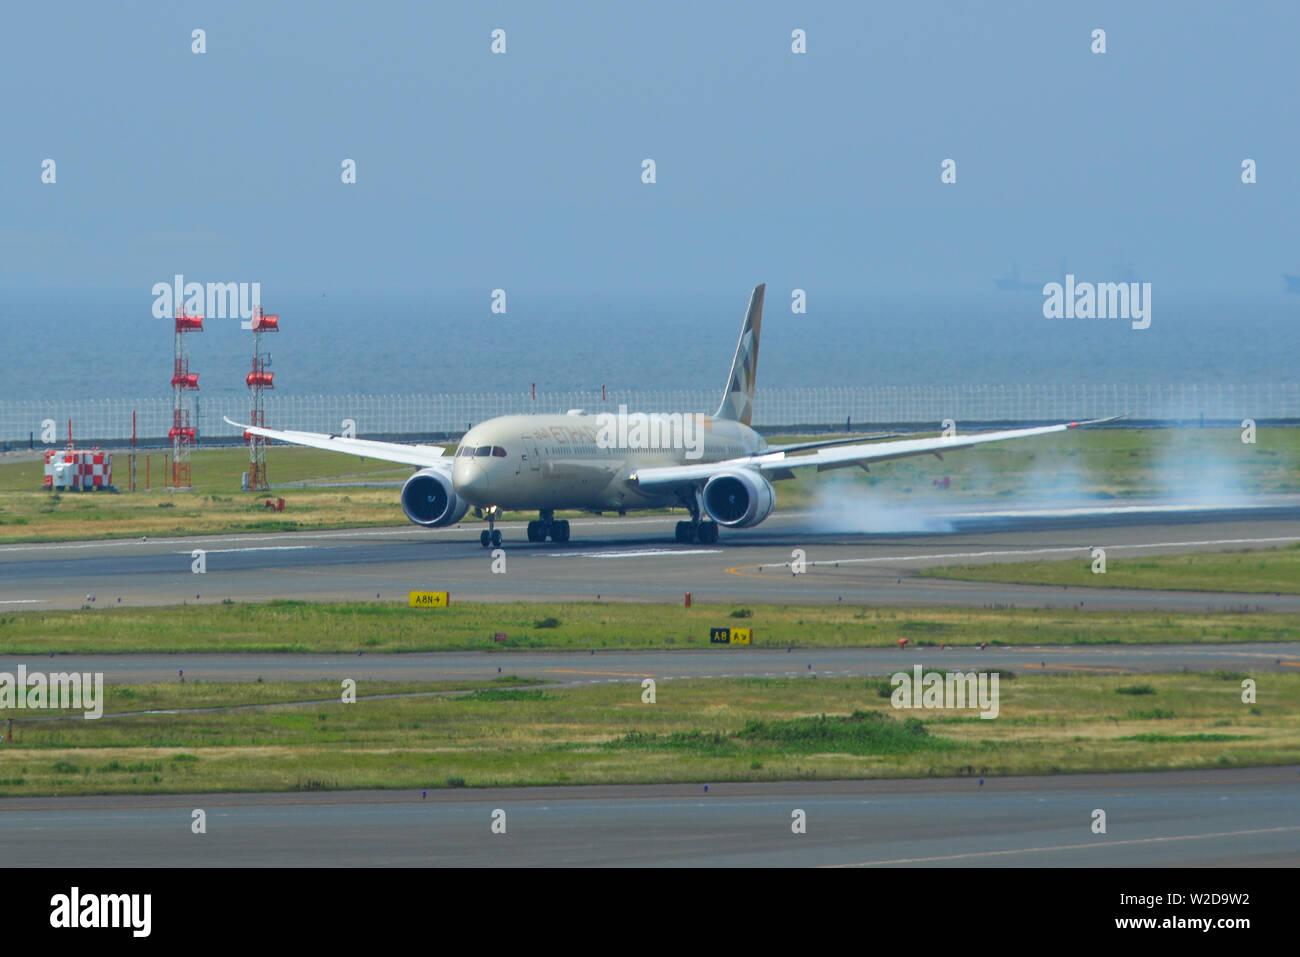 Nagoya, Japan - Jun 29, 2019. A6-BMA Etihad Airways Boeing 787-10 Dreamliner landing at the Chubu Centrair International Airport (NGO). - Stock Image